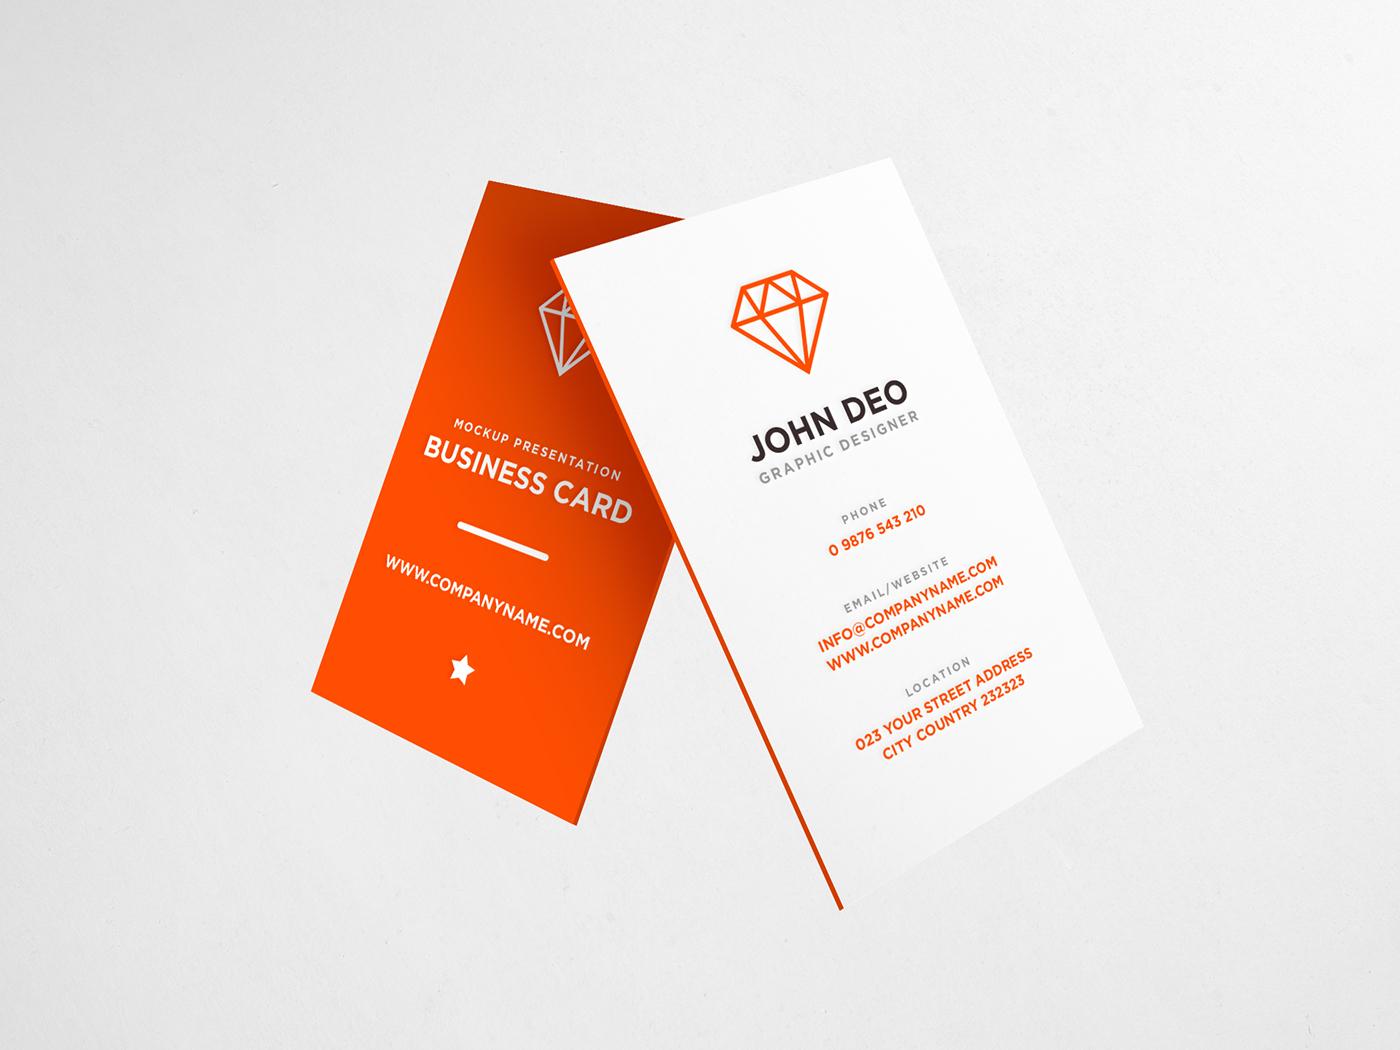 Download Business Card Mockup PSD - Freebie on Behance